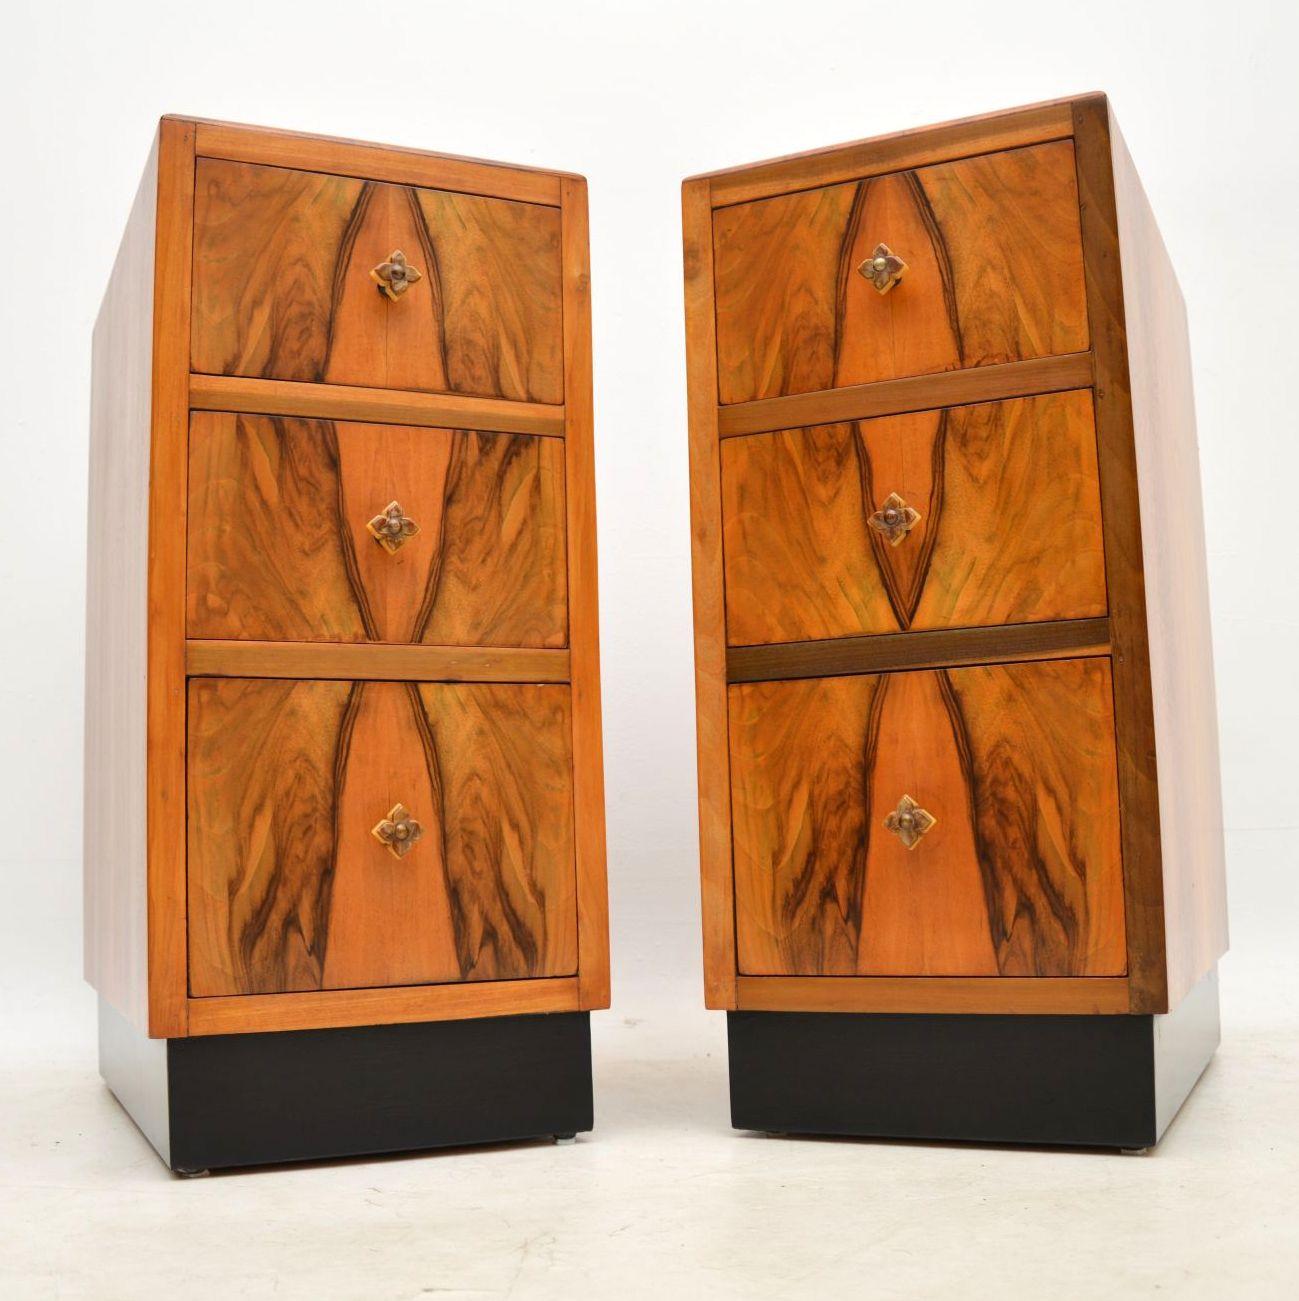 1920 S Pair Of Figured Walnut Art Deco Bedside Cabinets